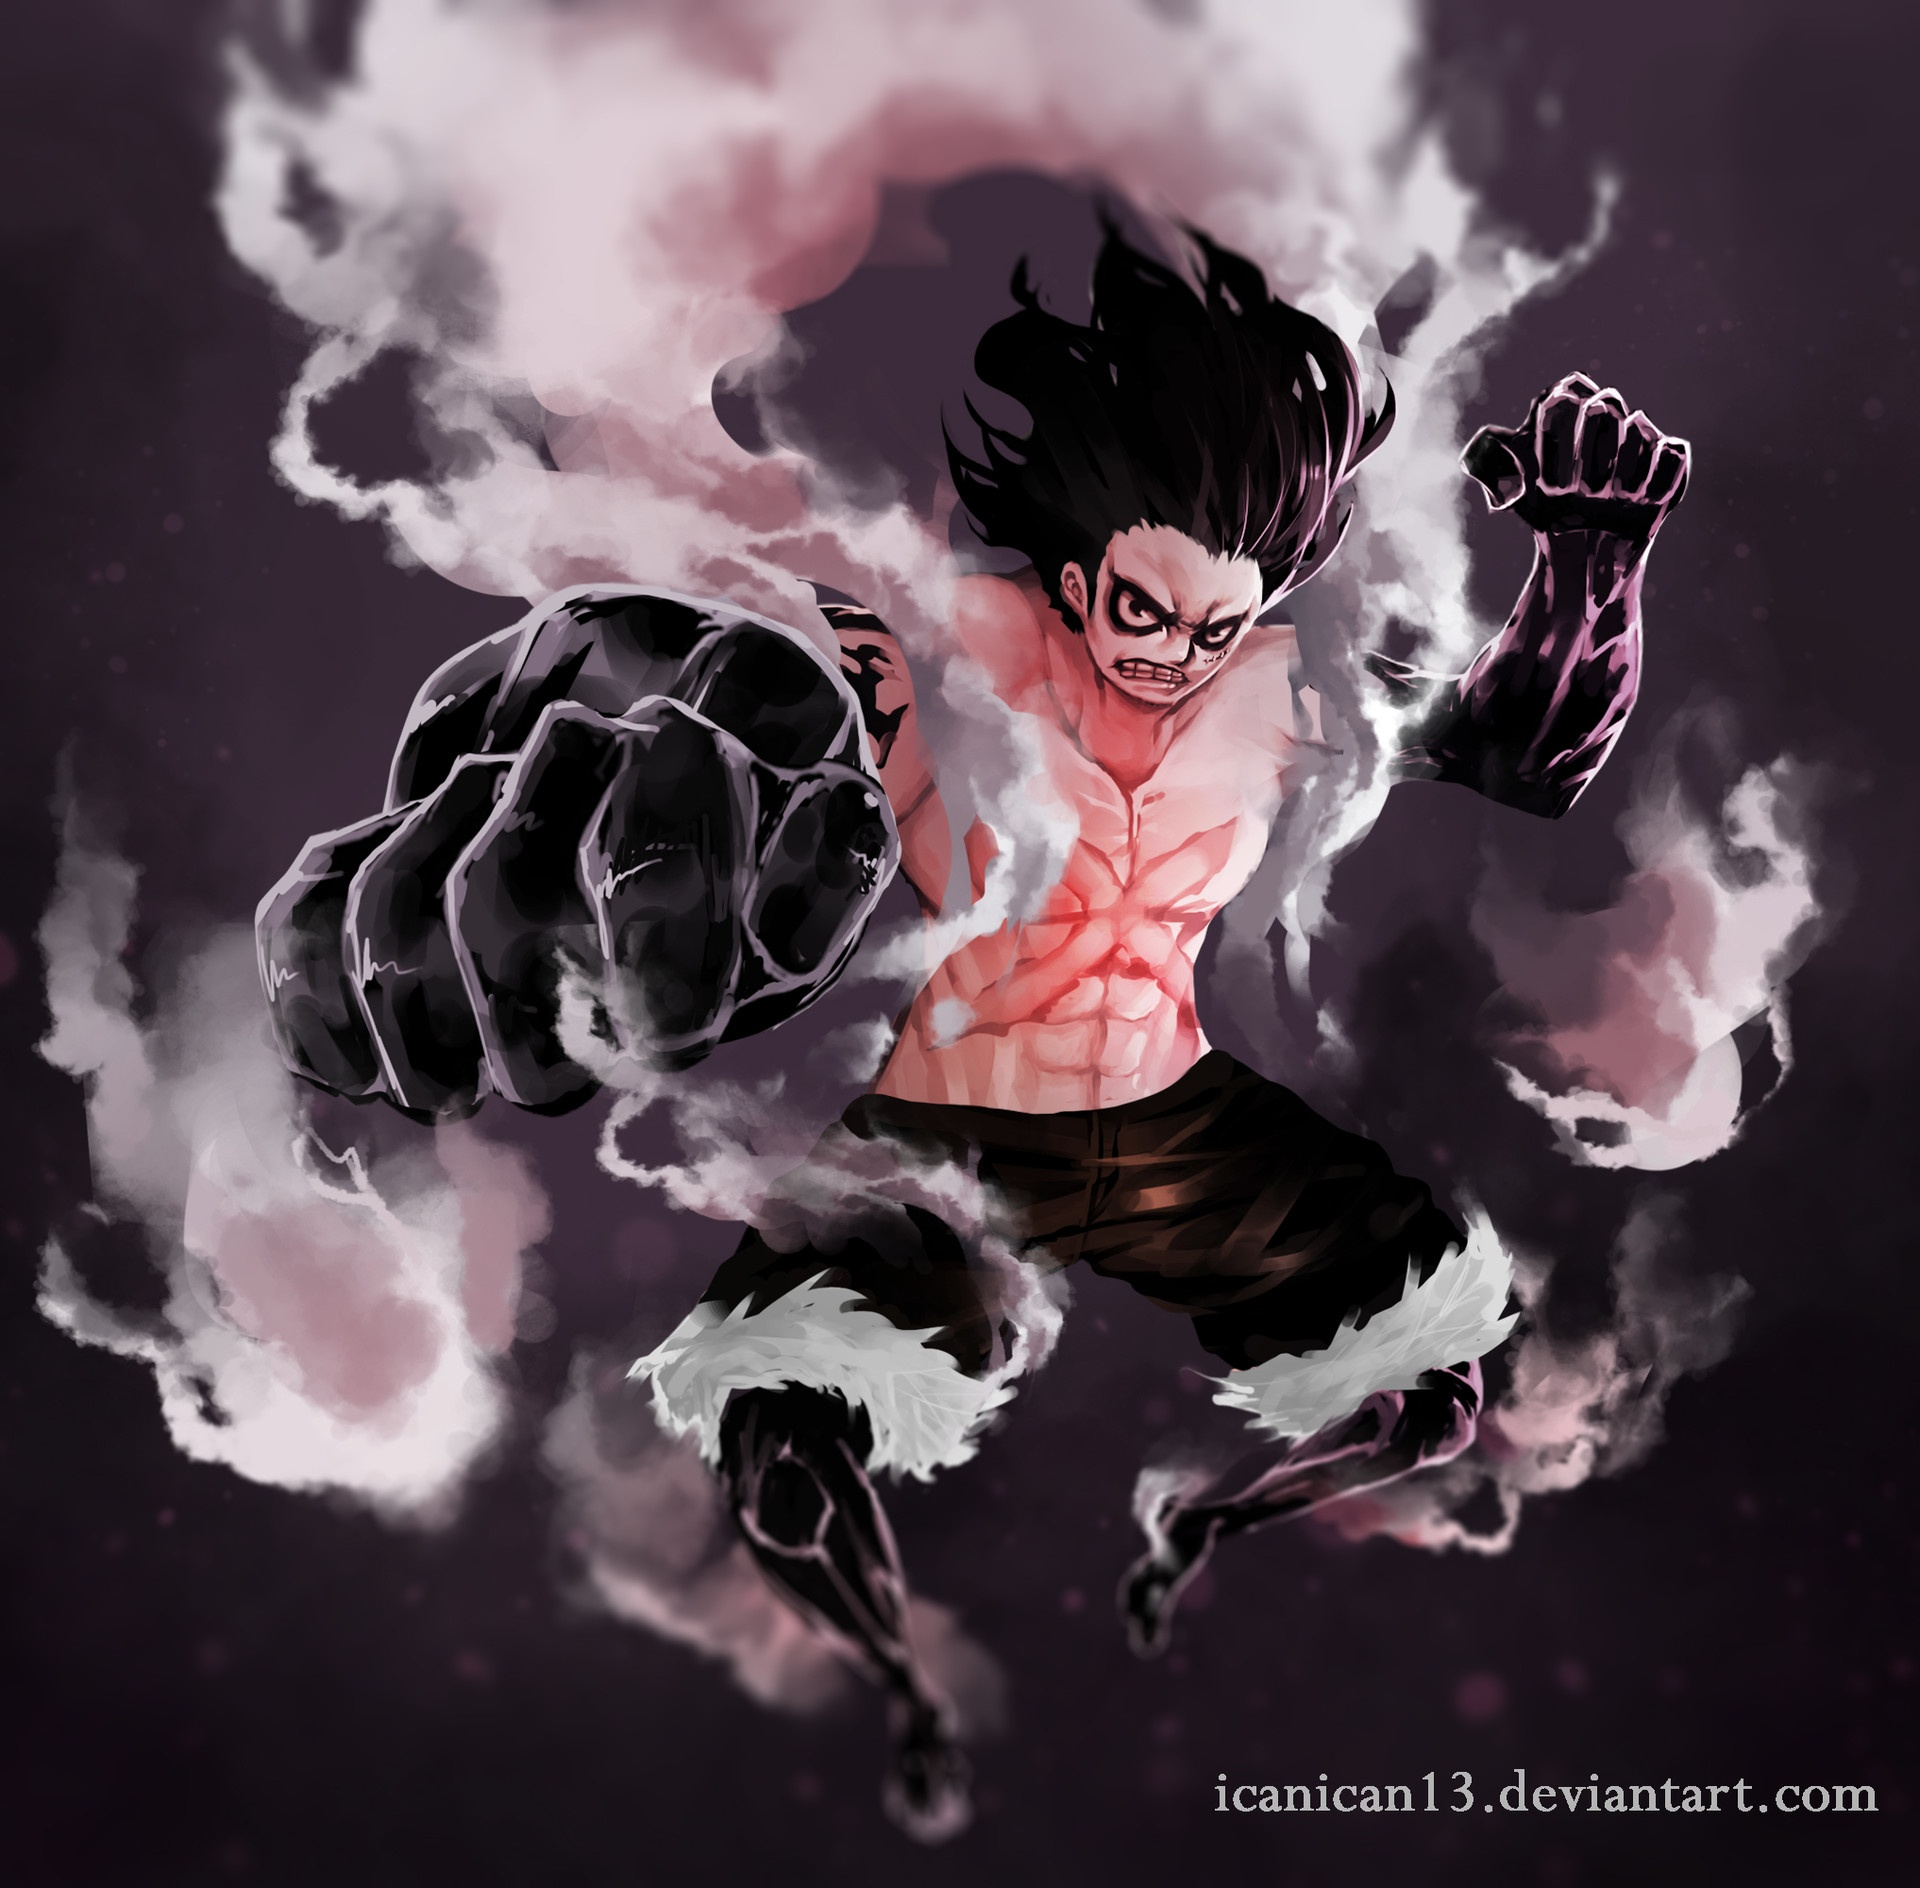 Why do people say Luffy beat Katakuri when he hit himself